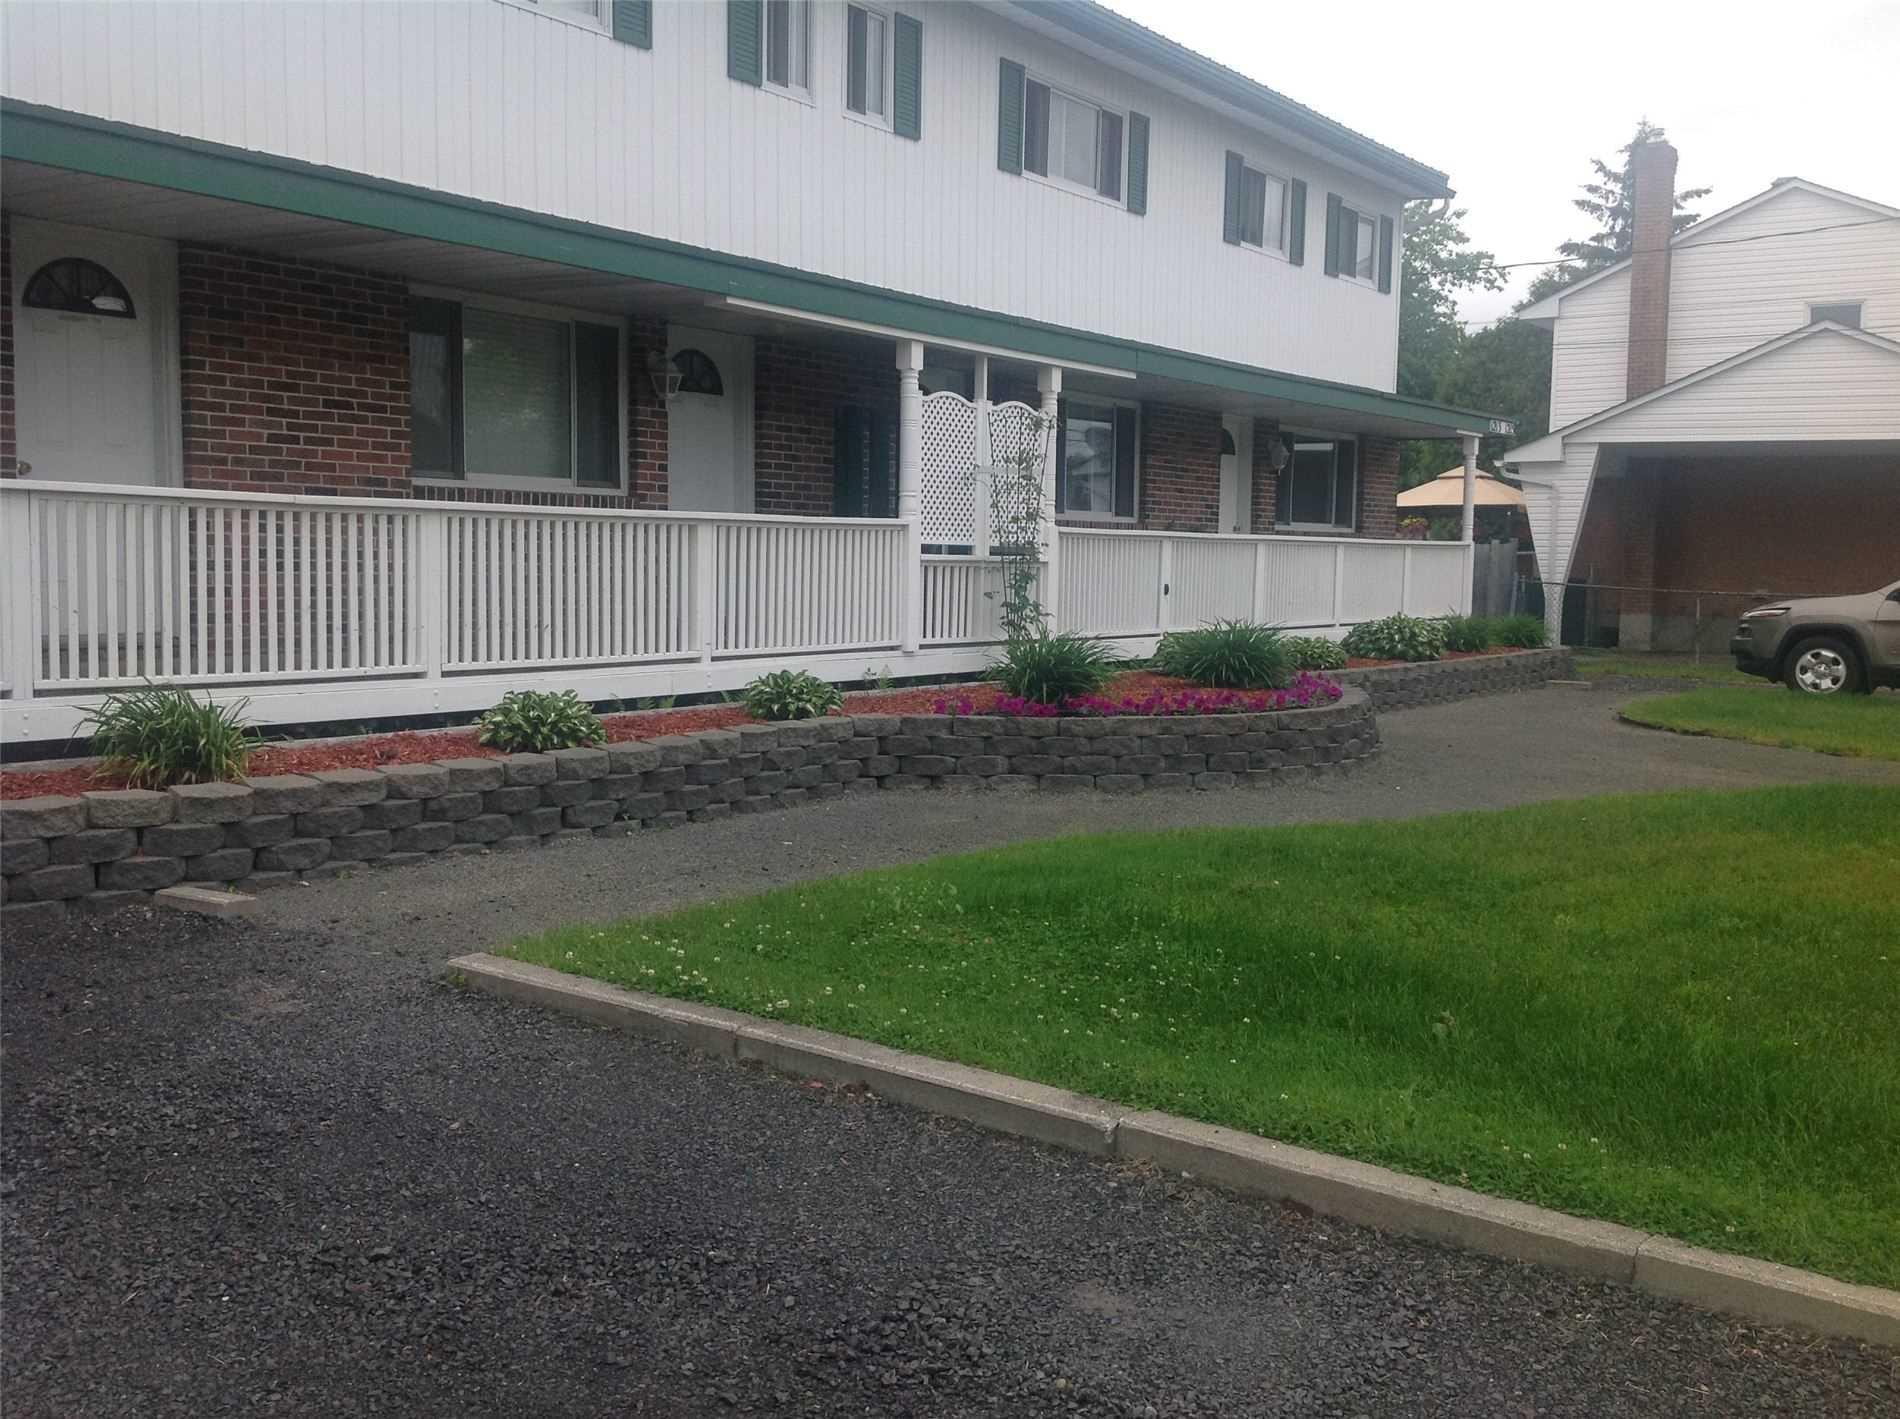 1209 Paquette St, Greater Sudbury, Ontario P3A3X9, 2 Bedrooms Bedrooms, ,2 BathroomsBathrooms,Fourplex,For Sale,Paquette,X5151675